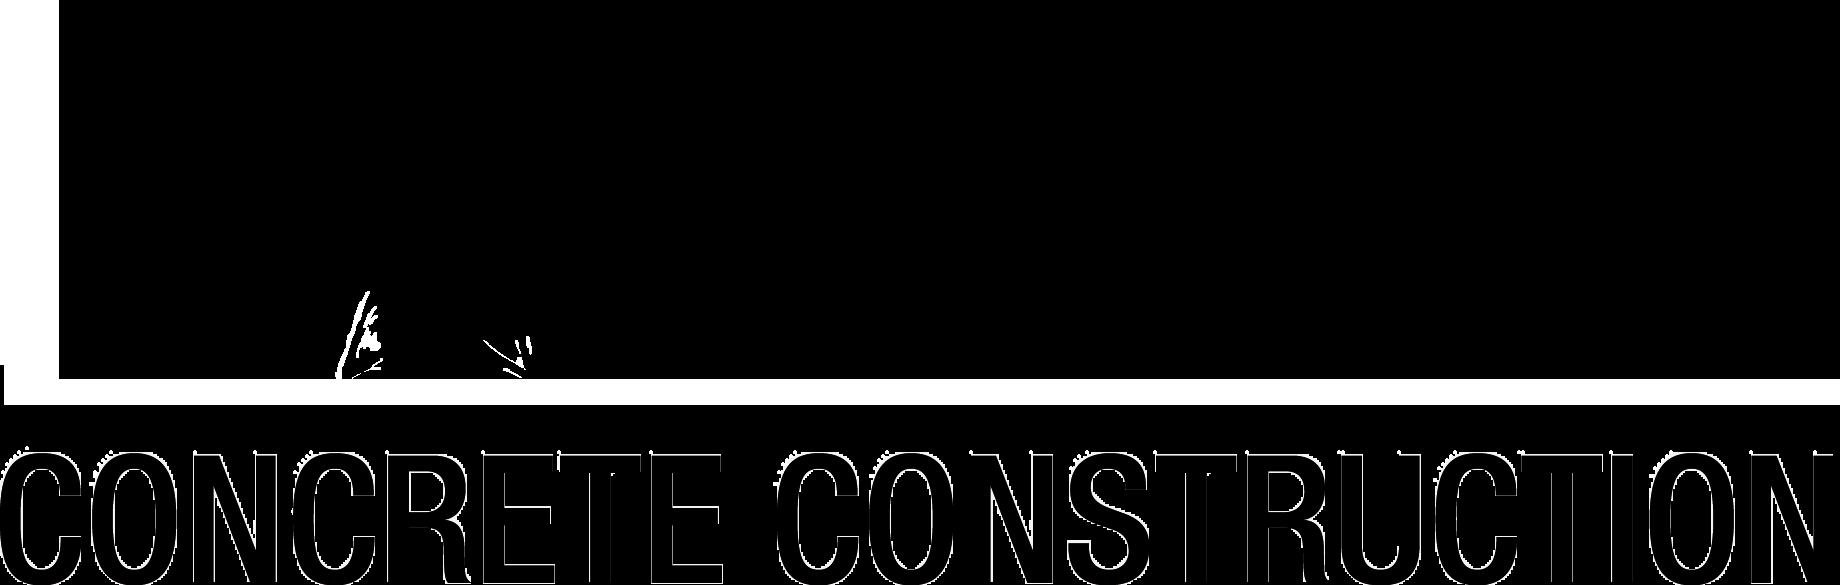 Concrete Finishers & Laborers image 1